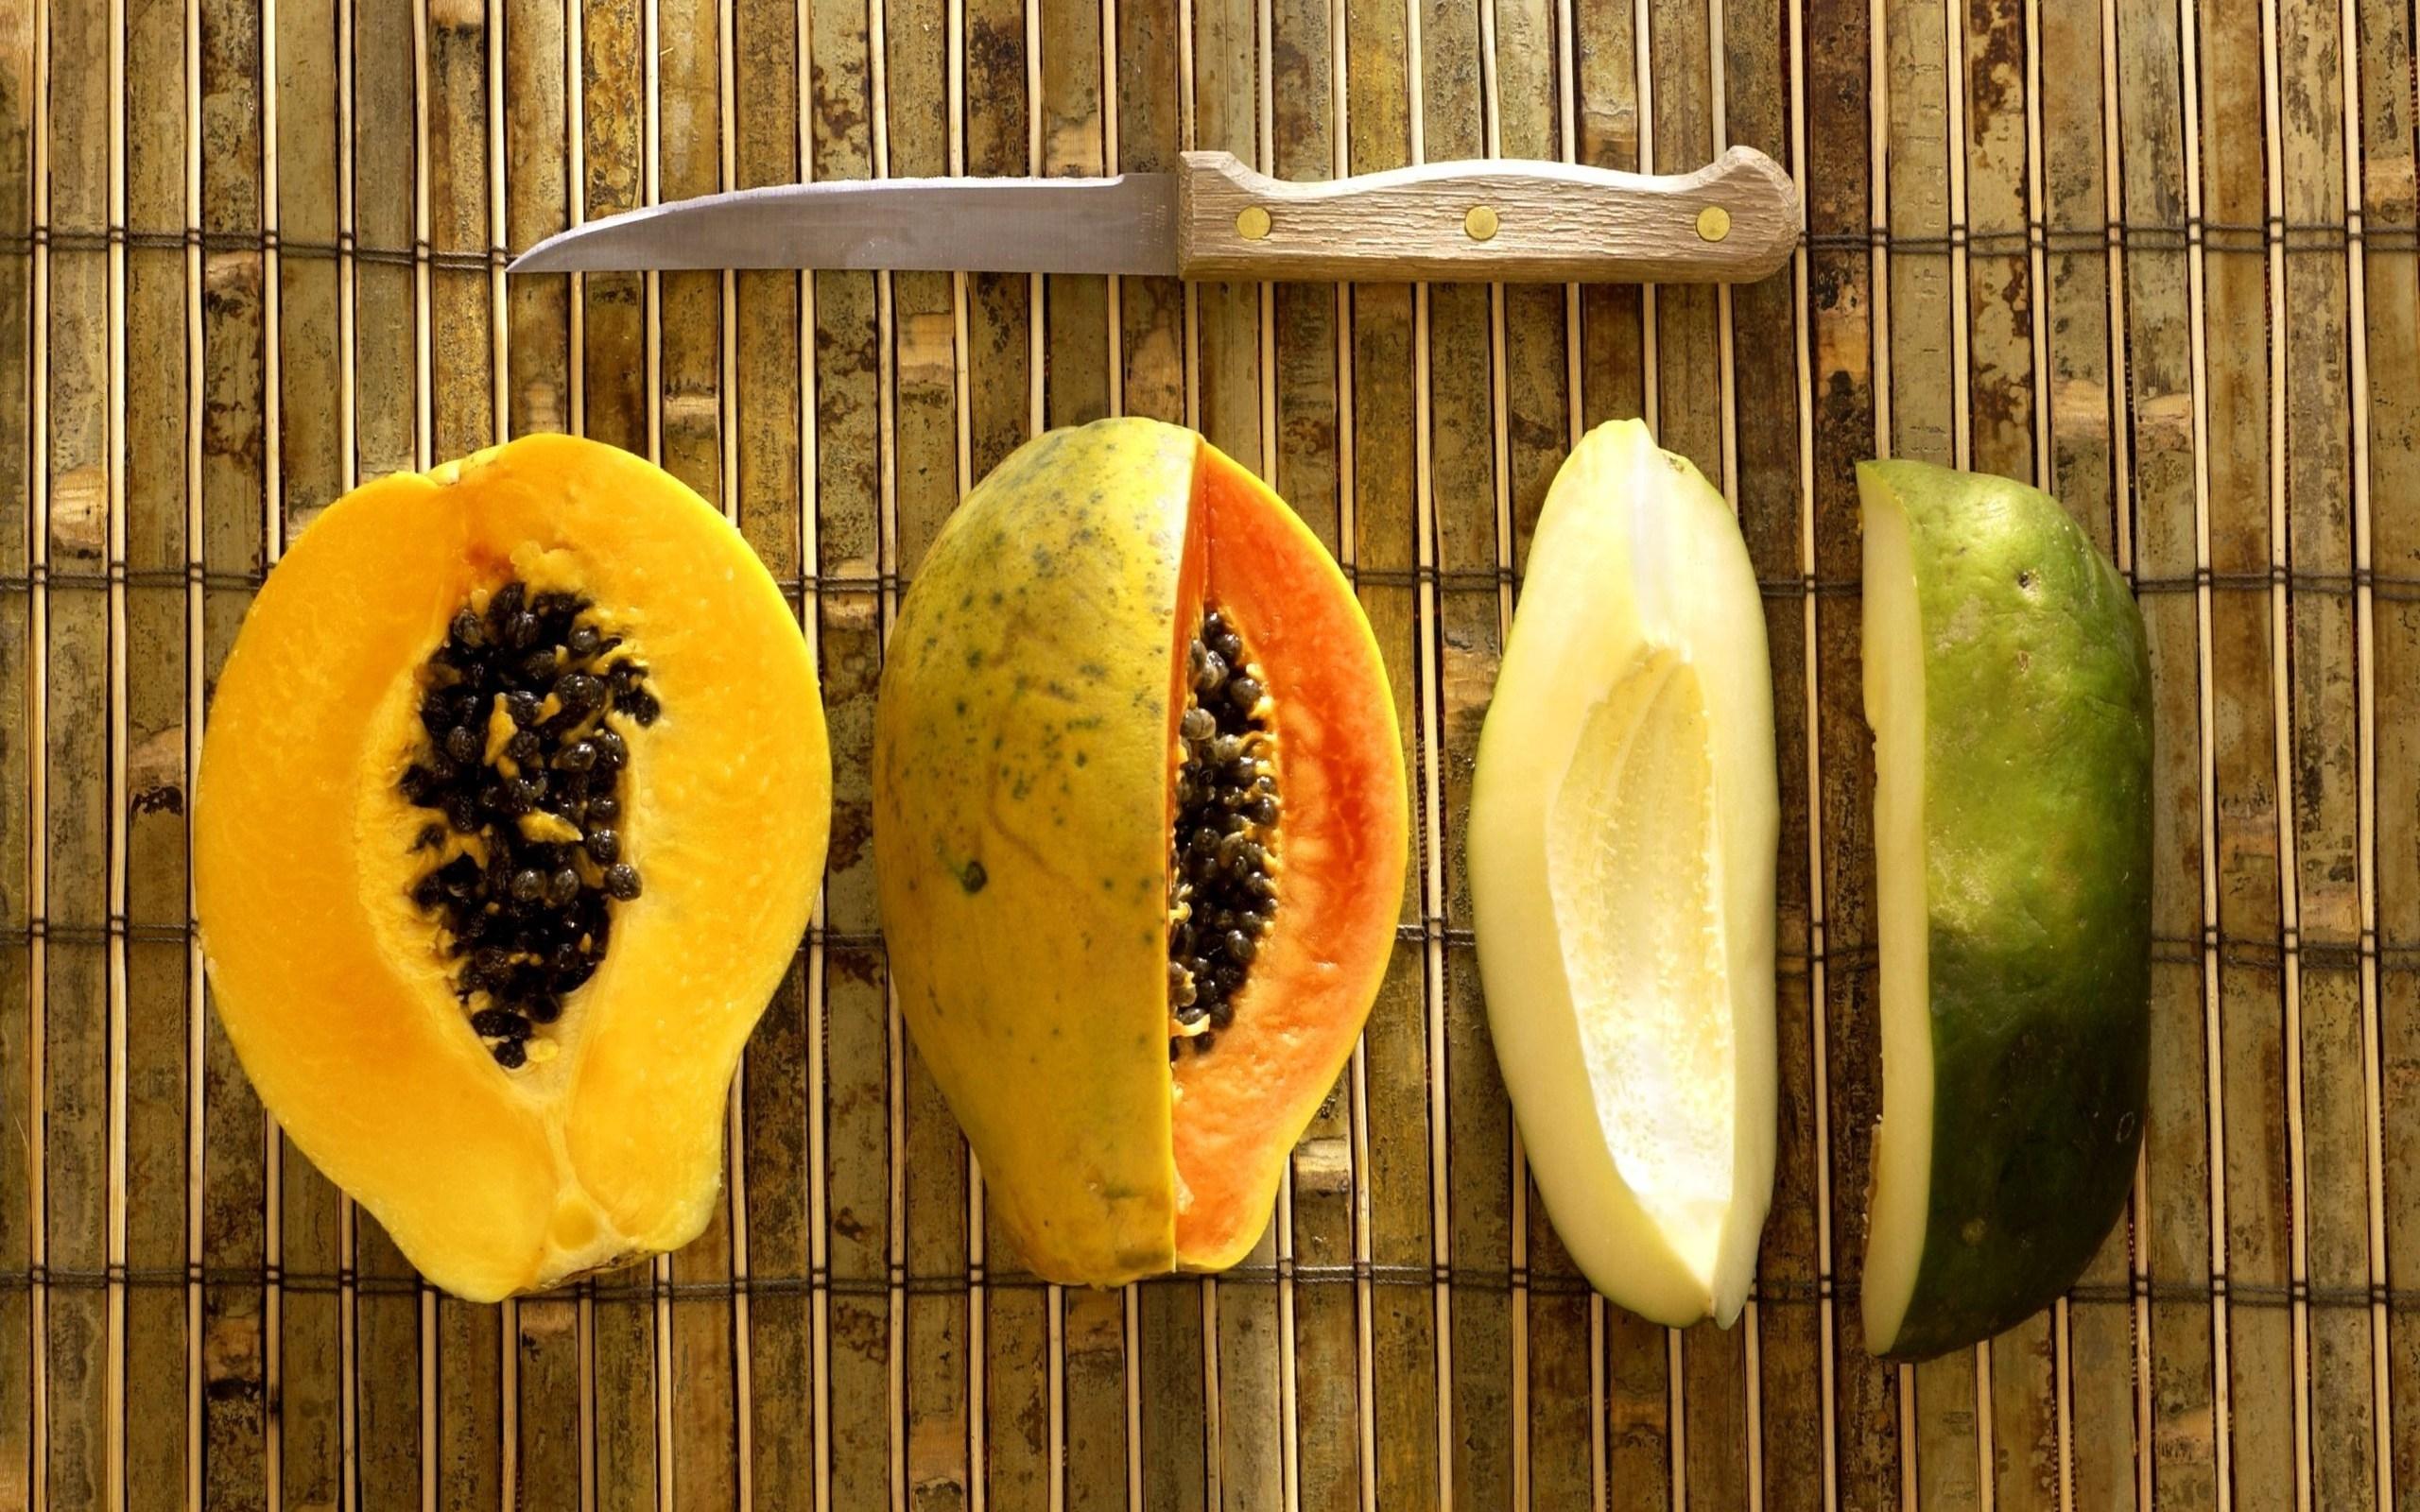 Papaya and avocado wallpapers and images - wallpapers ...